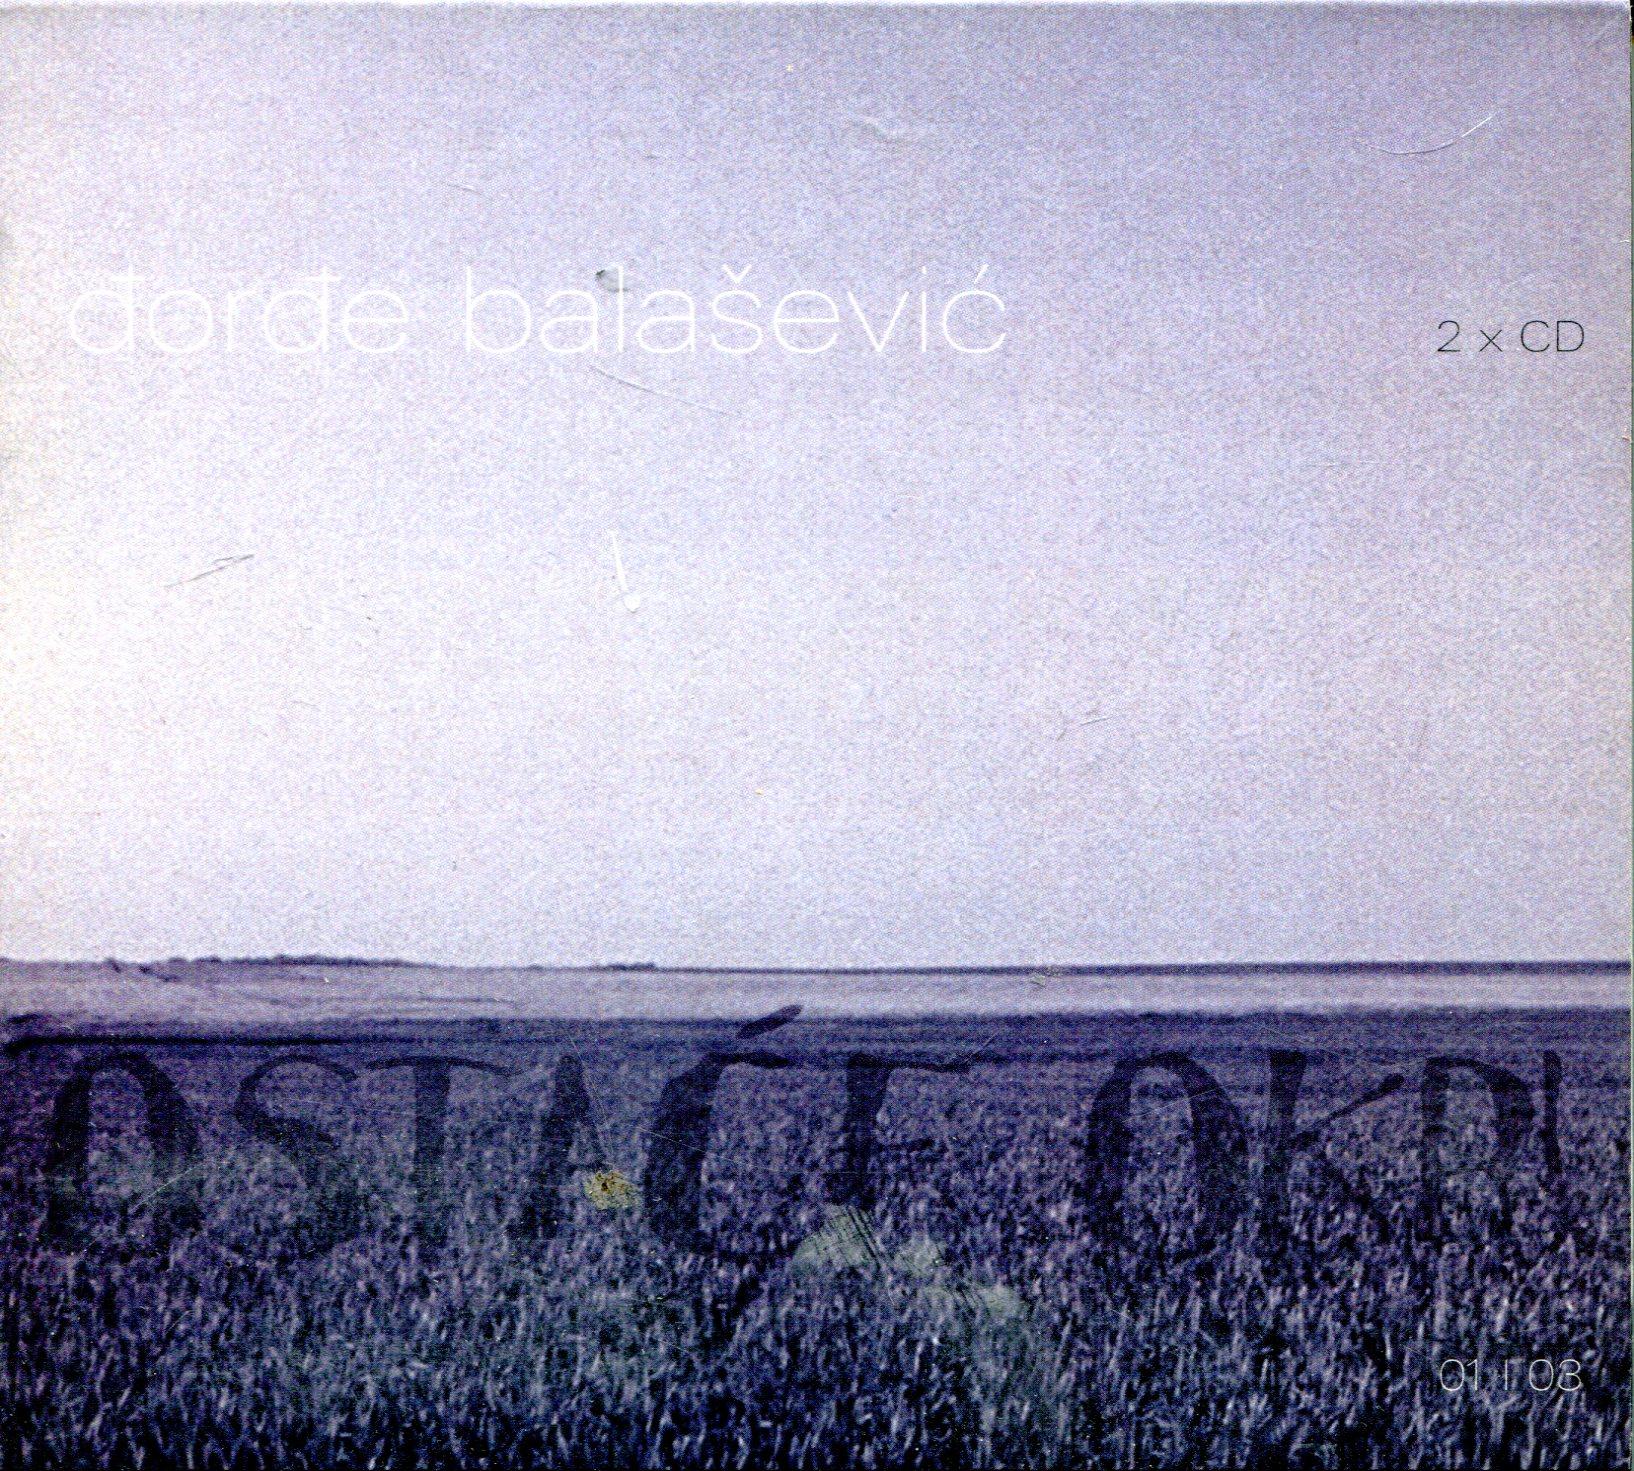 Ostaće okrugli trag na mestu šatre Đorđe Balašević